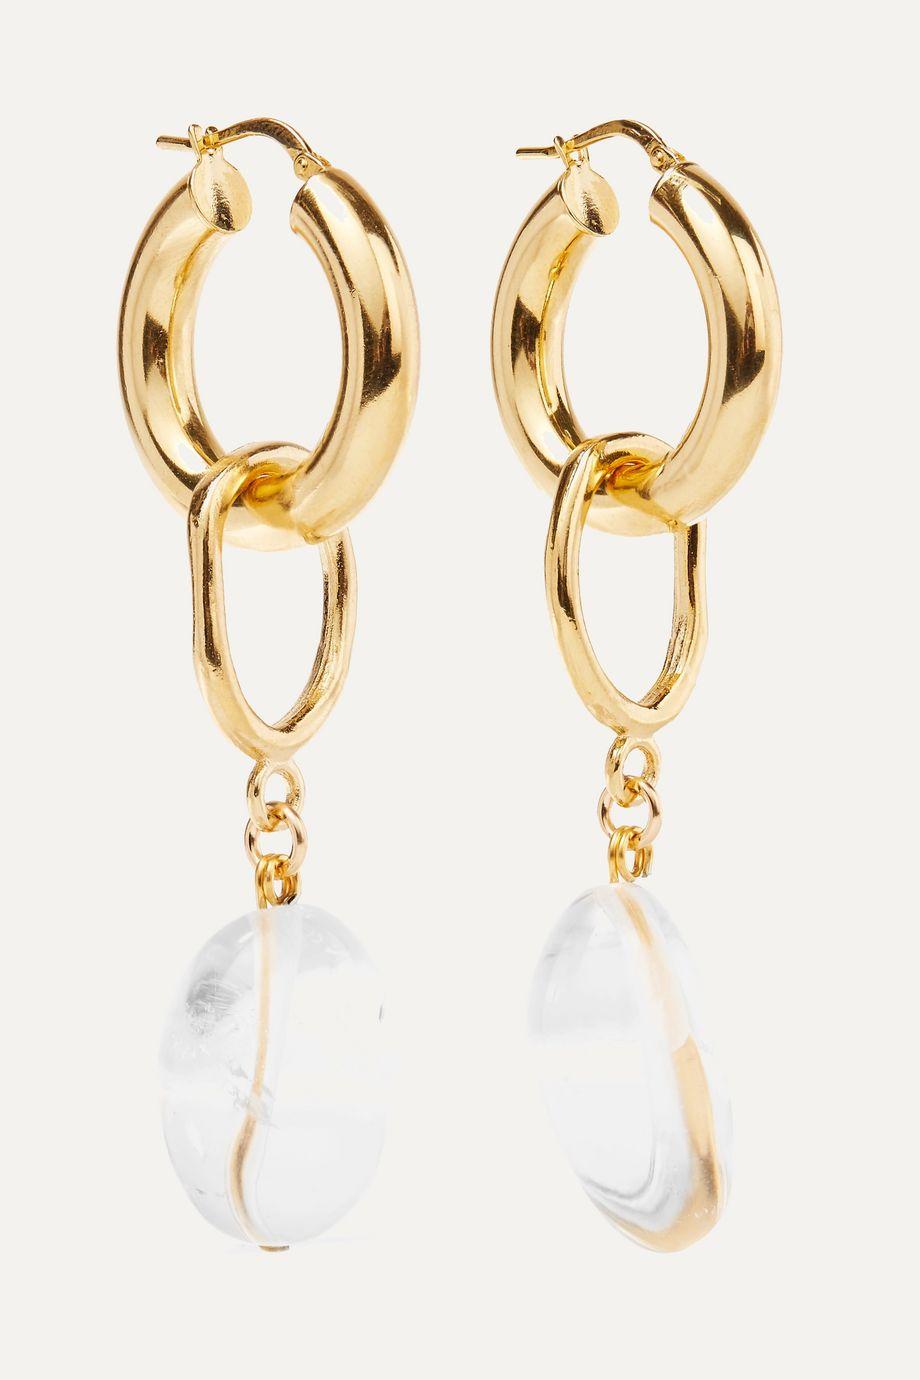 Mounser Found Objects 镀金玻璃耳环